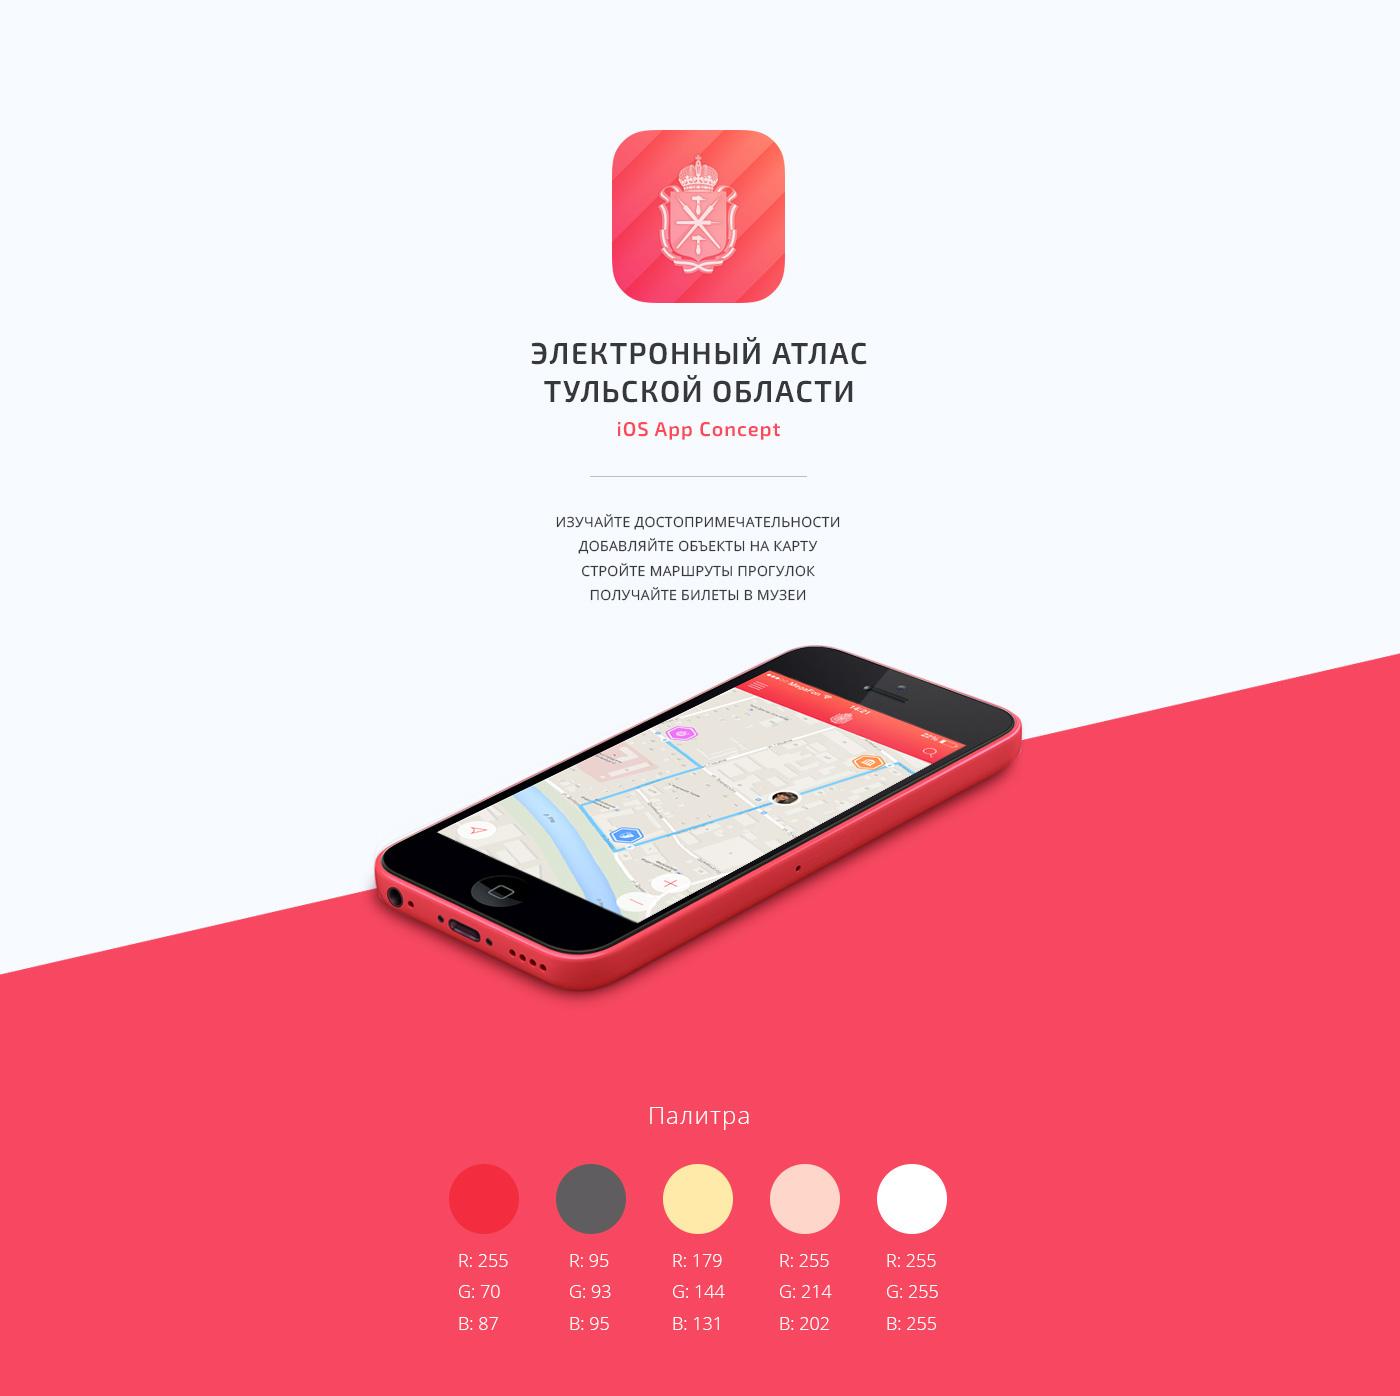 ios app Tula design iphone coatofarms GEO map pin GIS route way Interface mobile UI